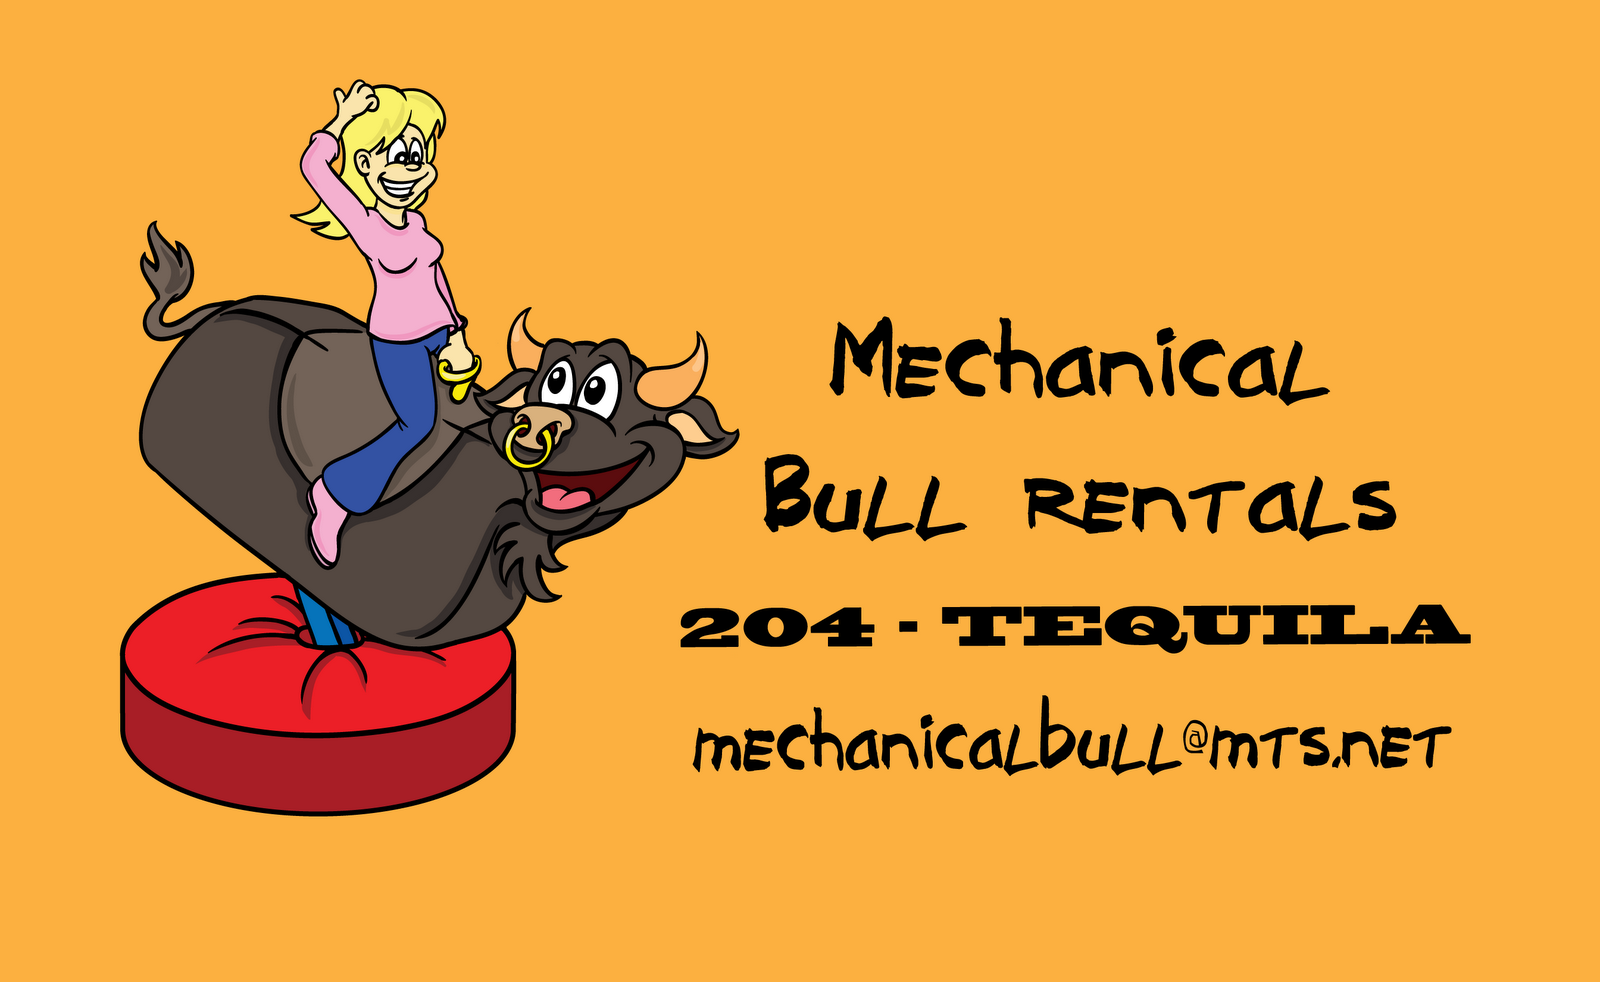 Mechanical bull riding cartoon